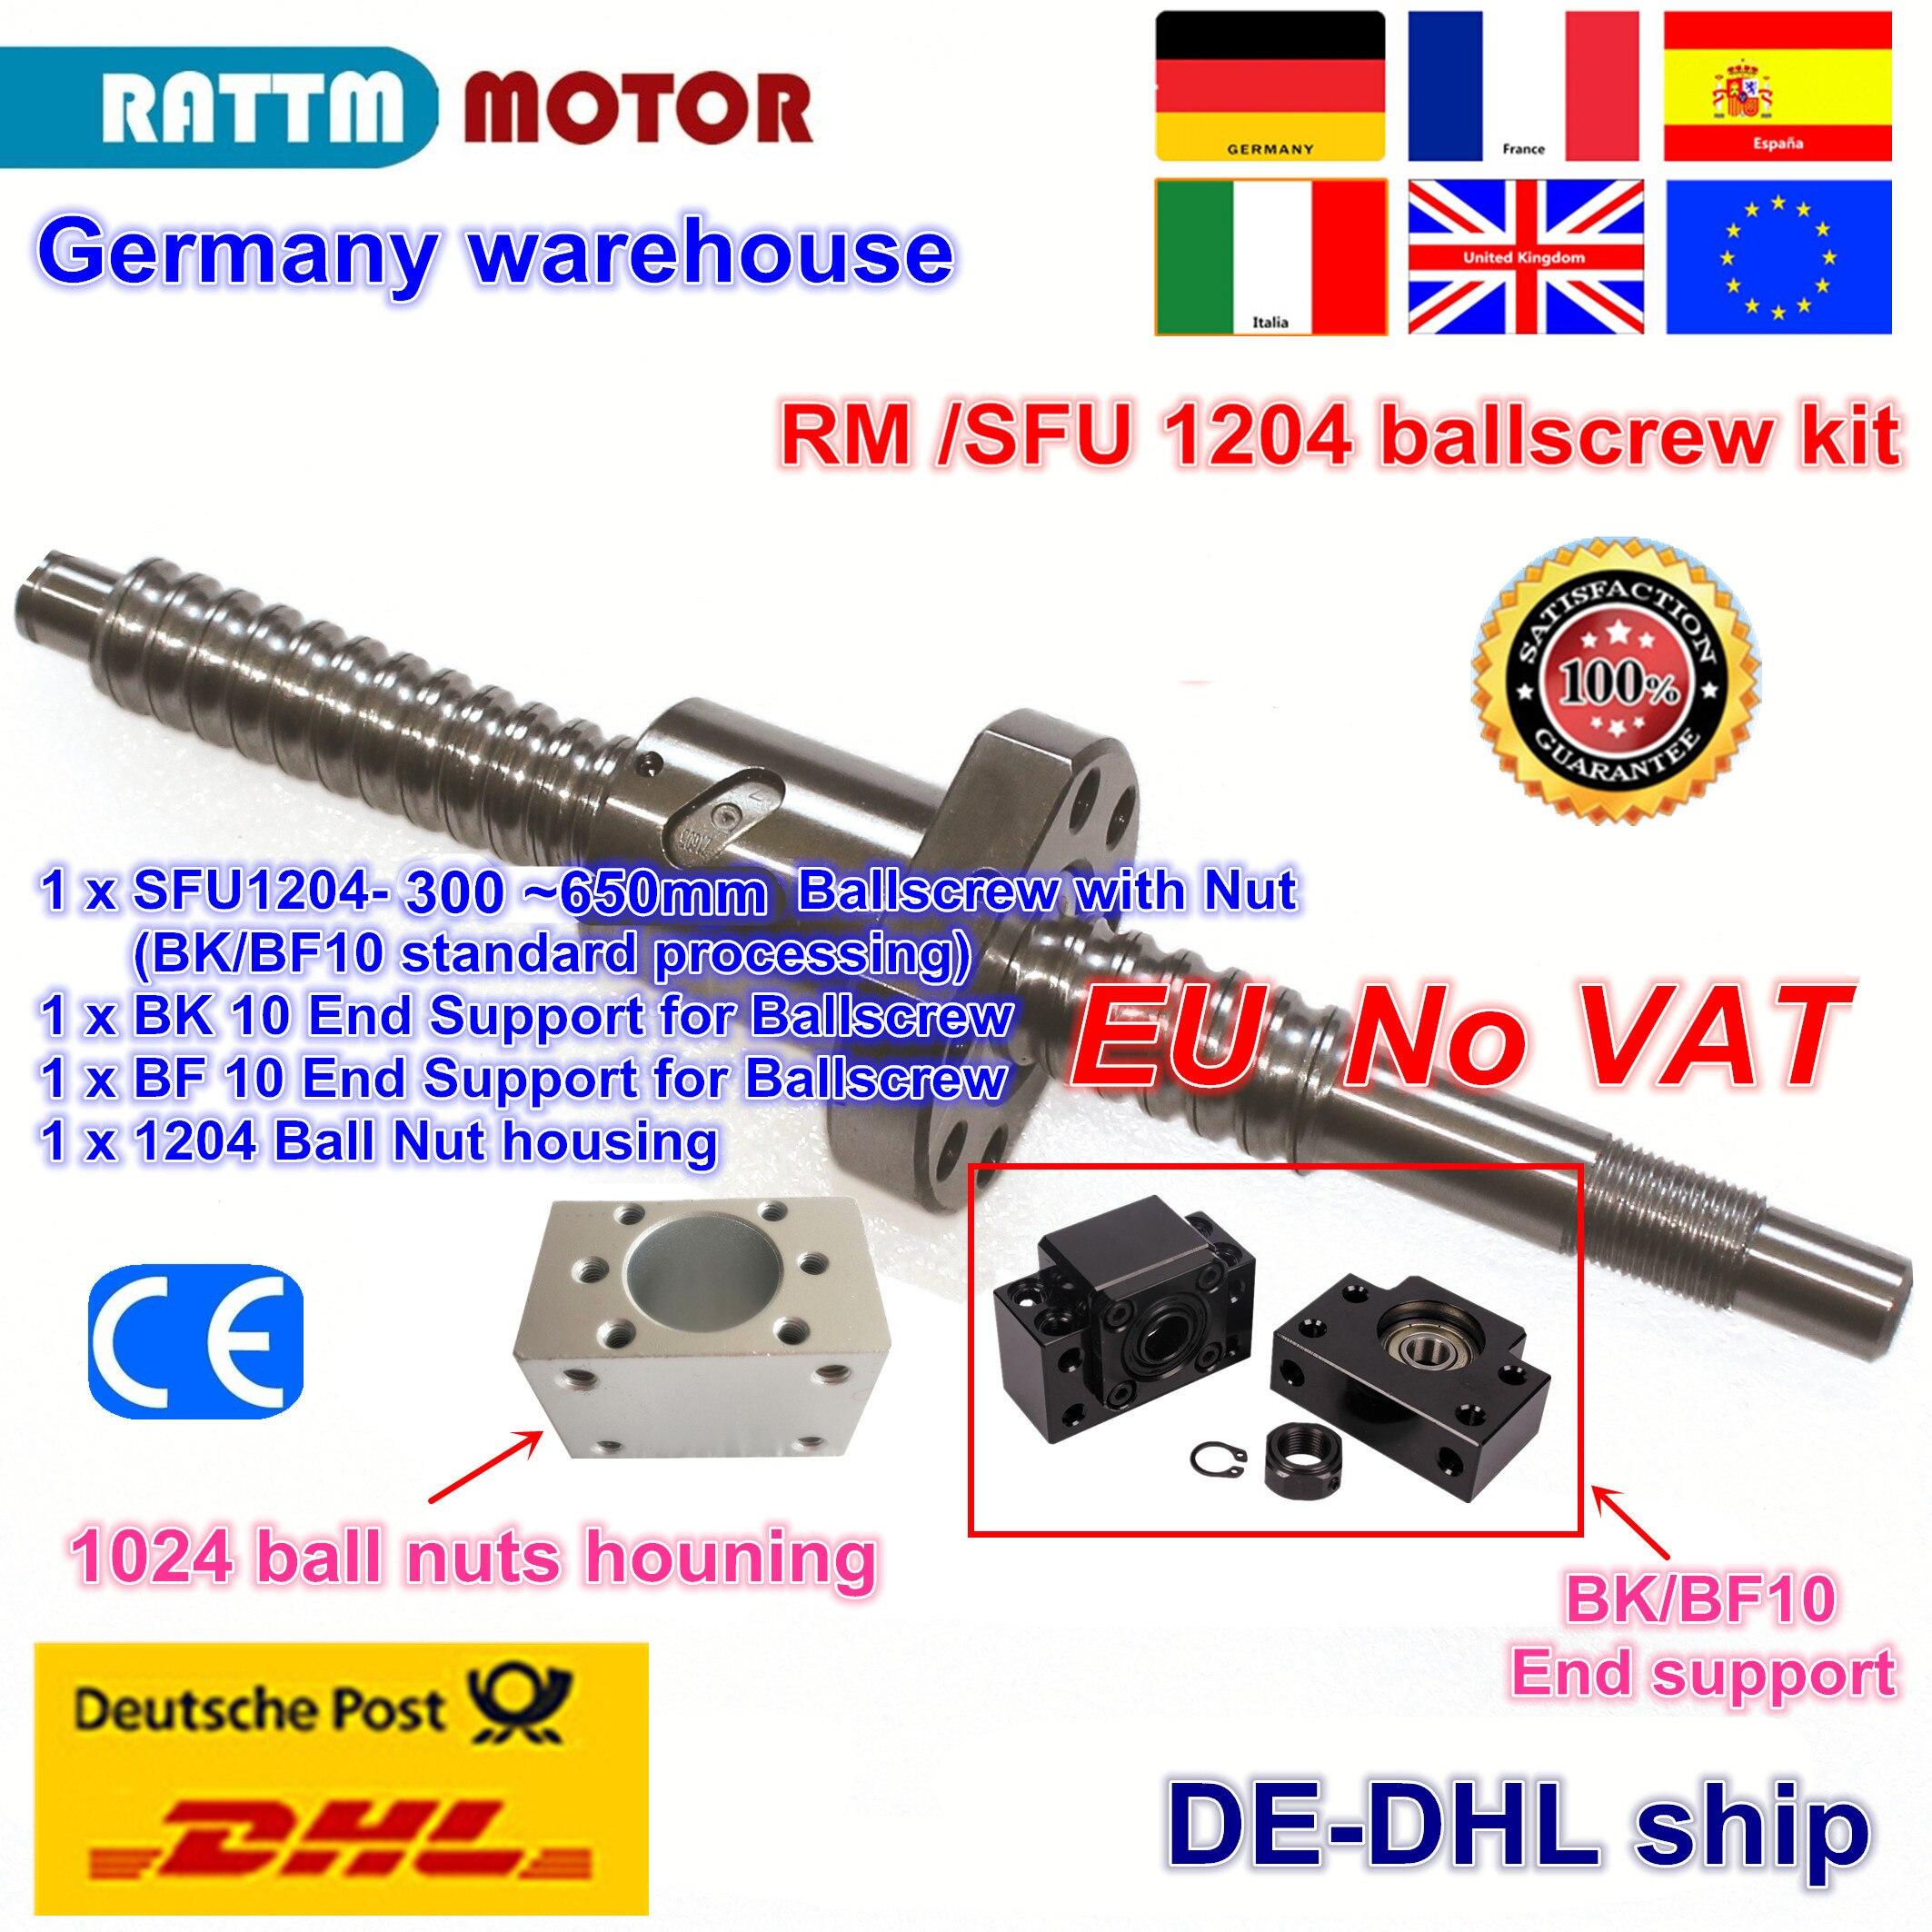 EU free VAT SFU / RM 1204 Ballscrew - L300/350/400/500/600/650mm+ 1204 Ballnut + BK/BF10 End support+ Ball Nut Housing for CNC